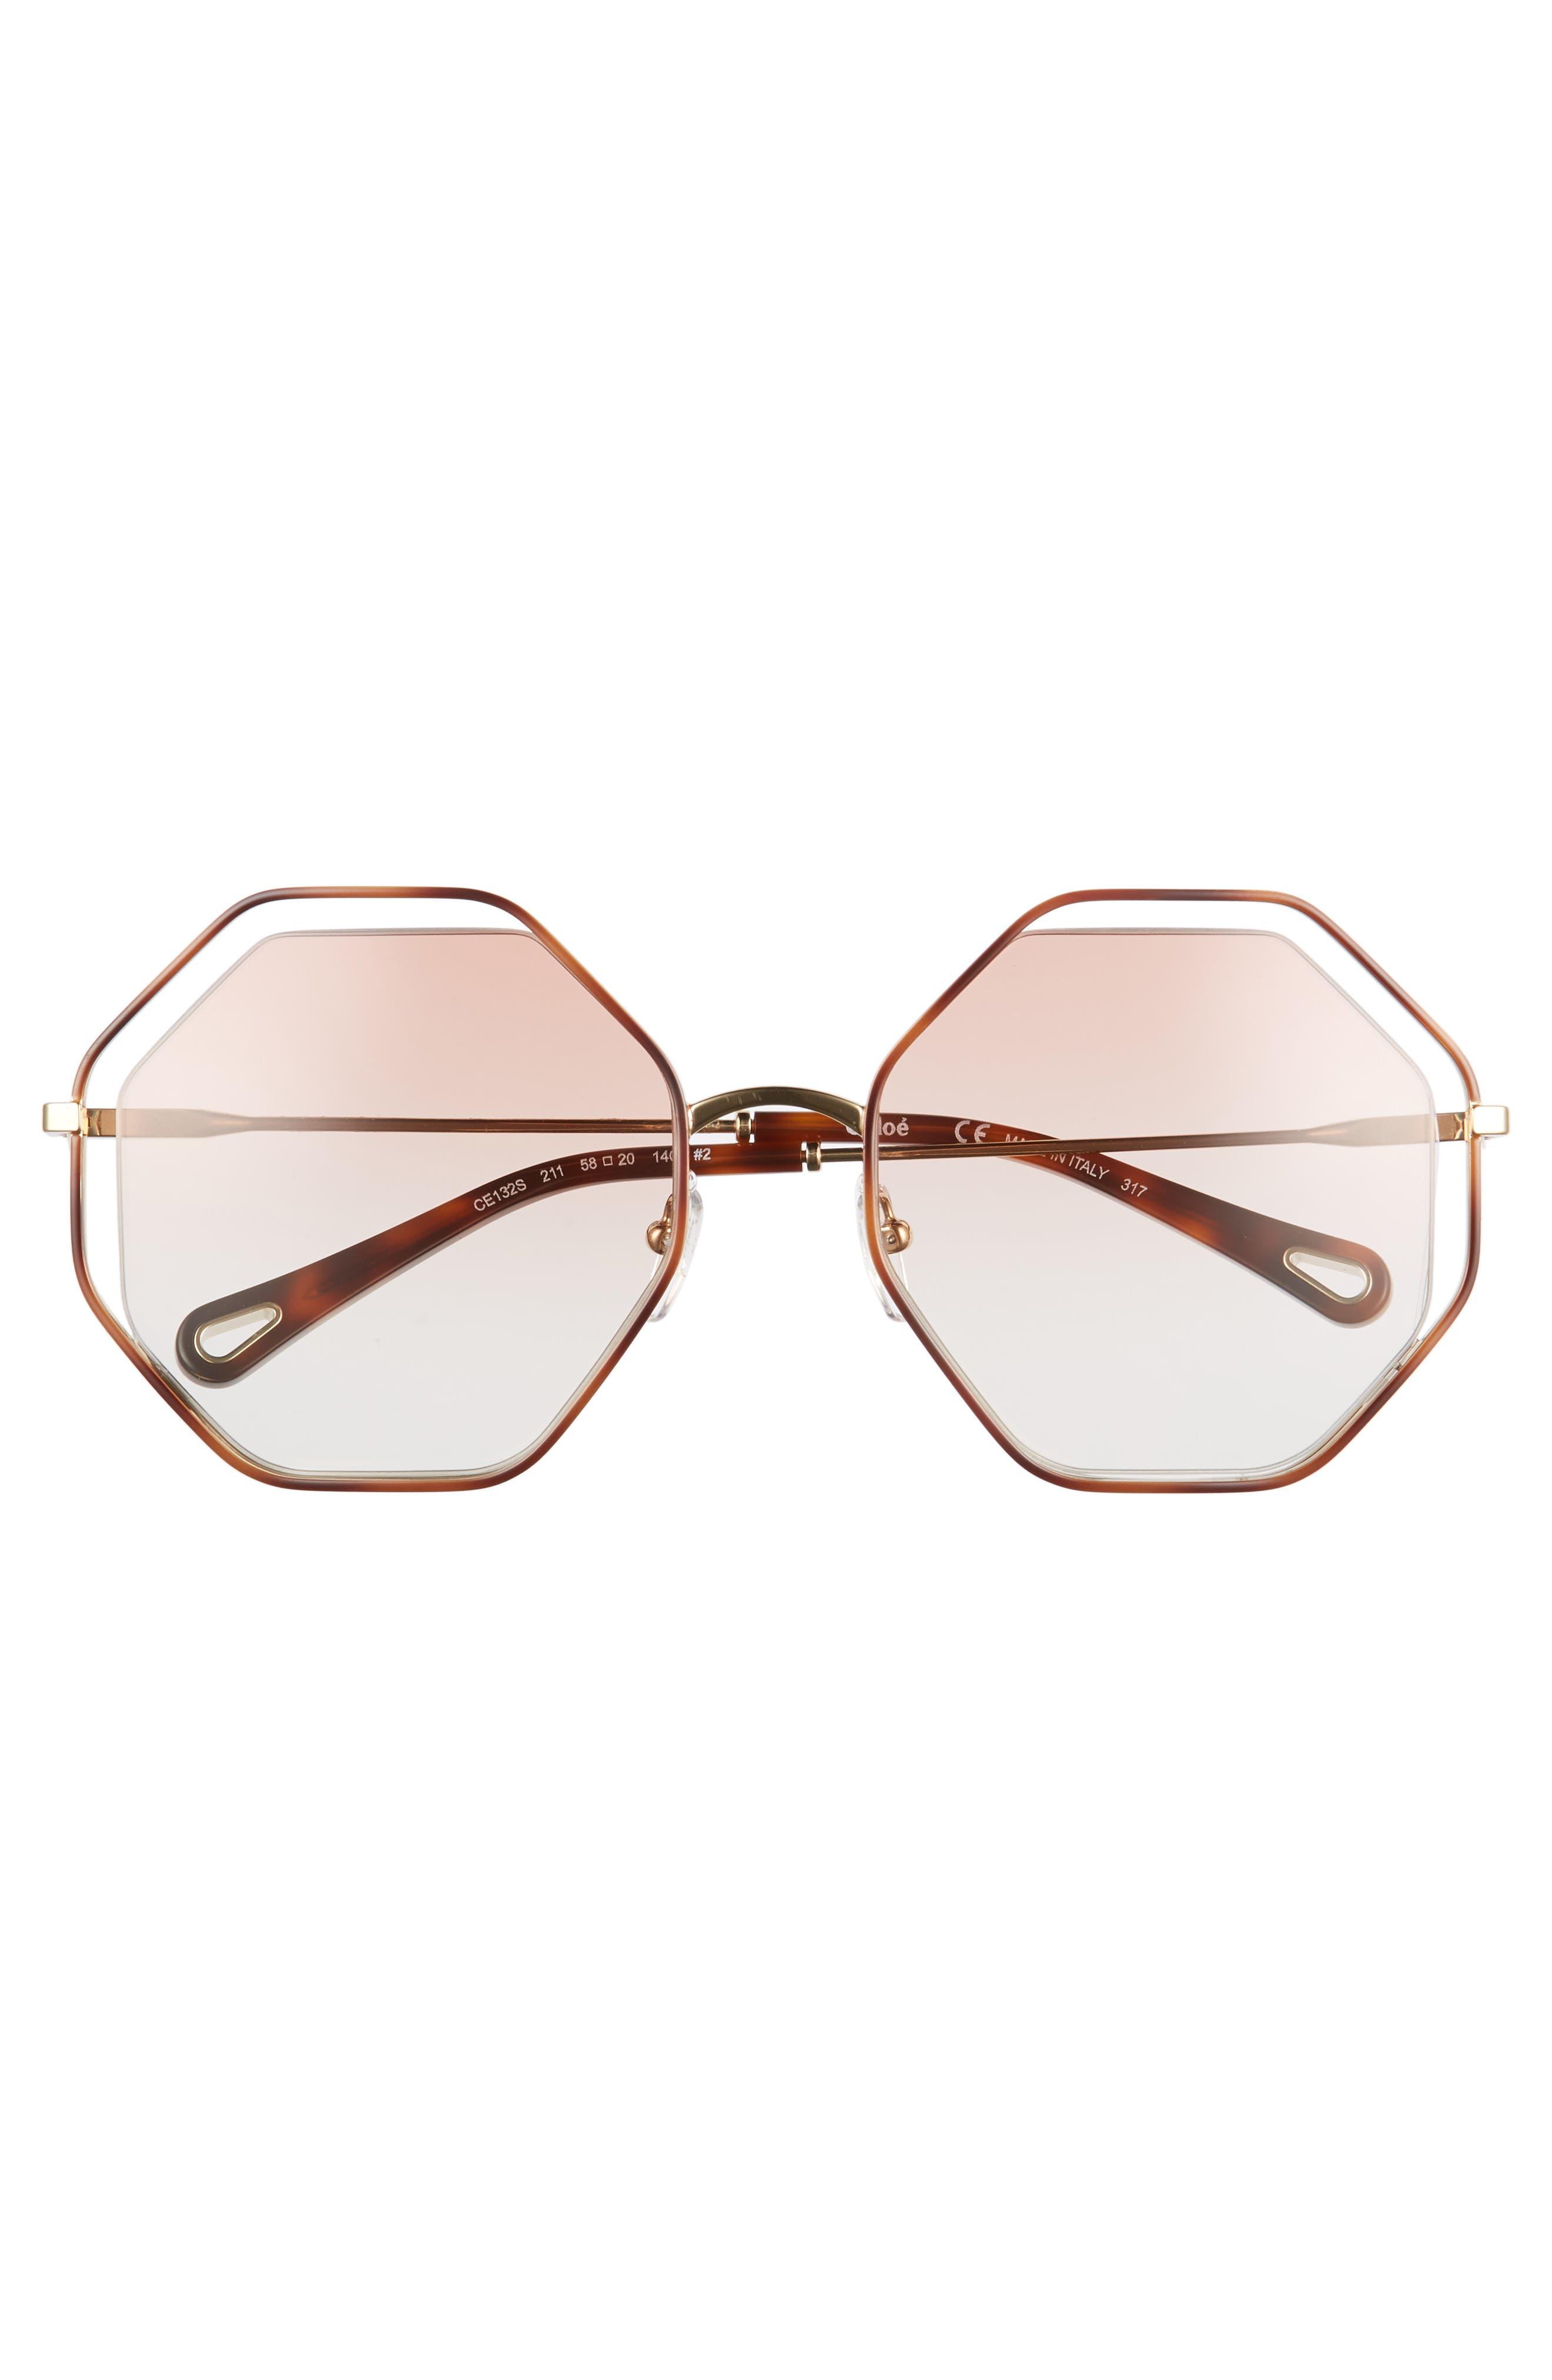 58mm Octagonal Halo Lens Sunglasses,                             Alternate thumbnail 3, color,                             HAVANA/ PEACH